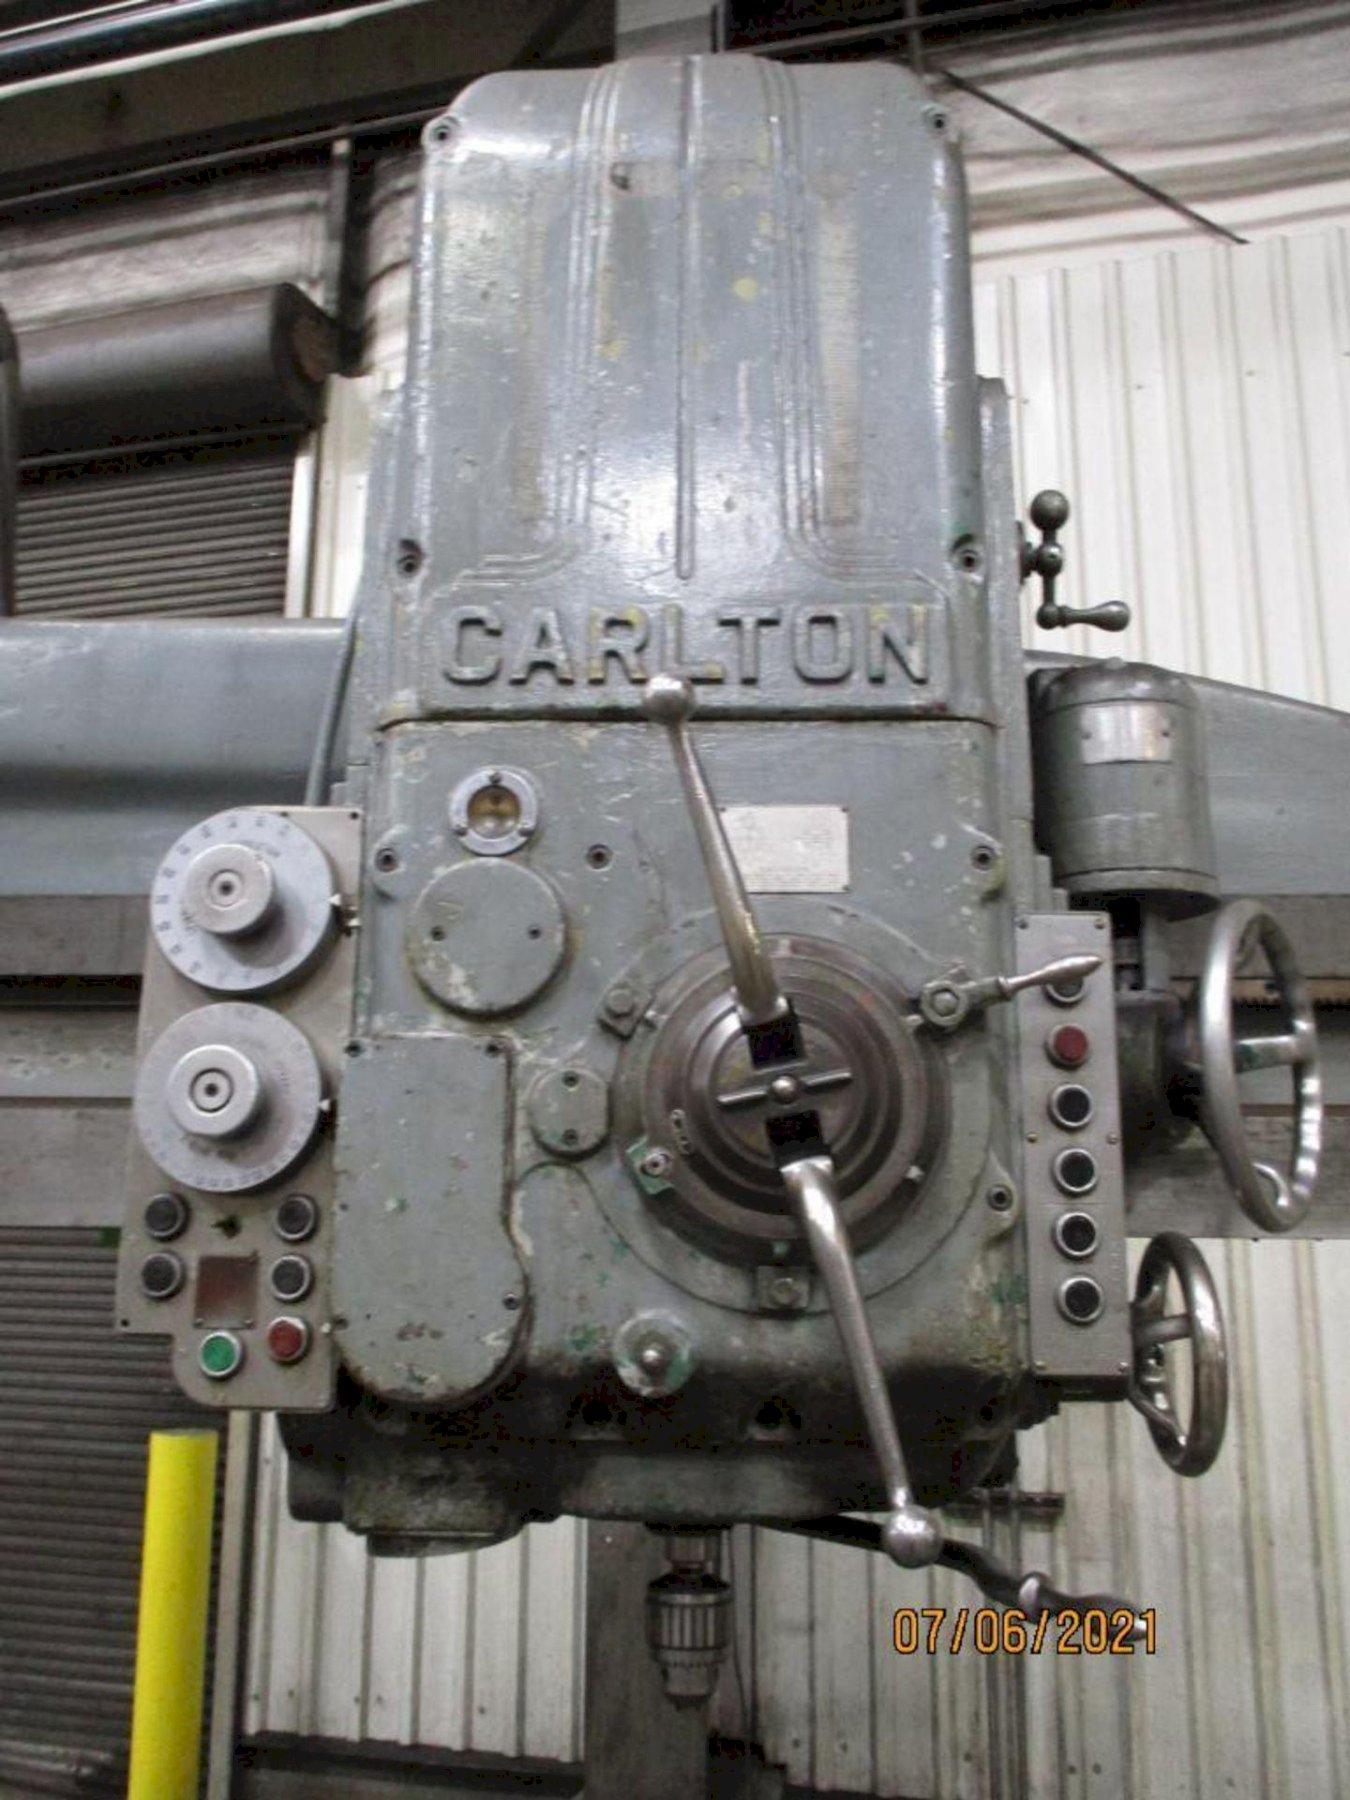 "6' X 15"" CARLTON 3A RADIAL ARM DRILL. STOCK # 0844121"